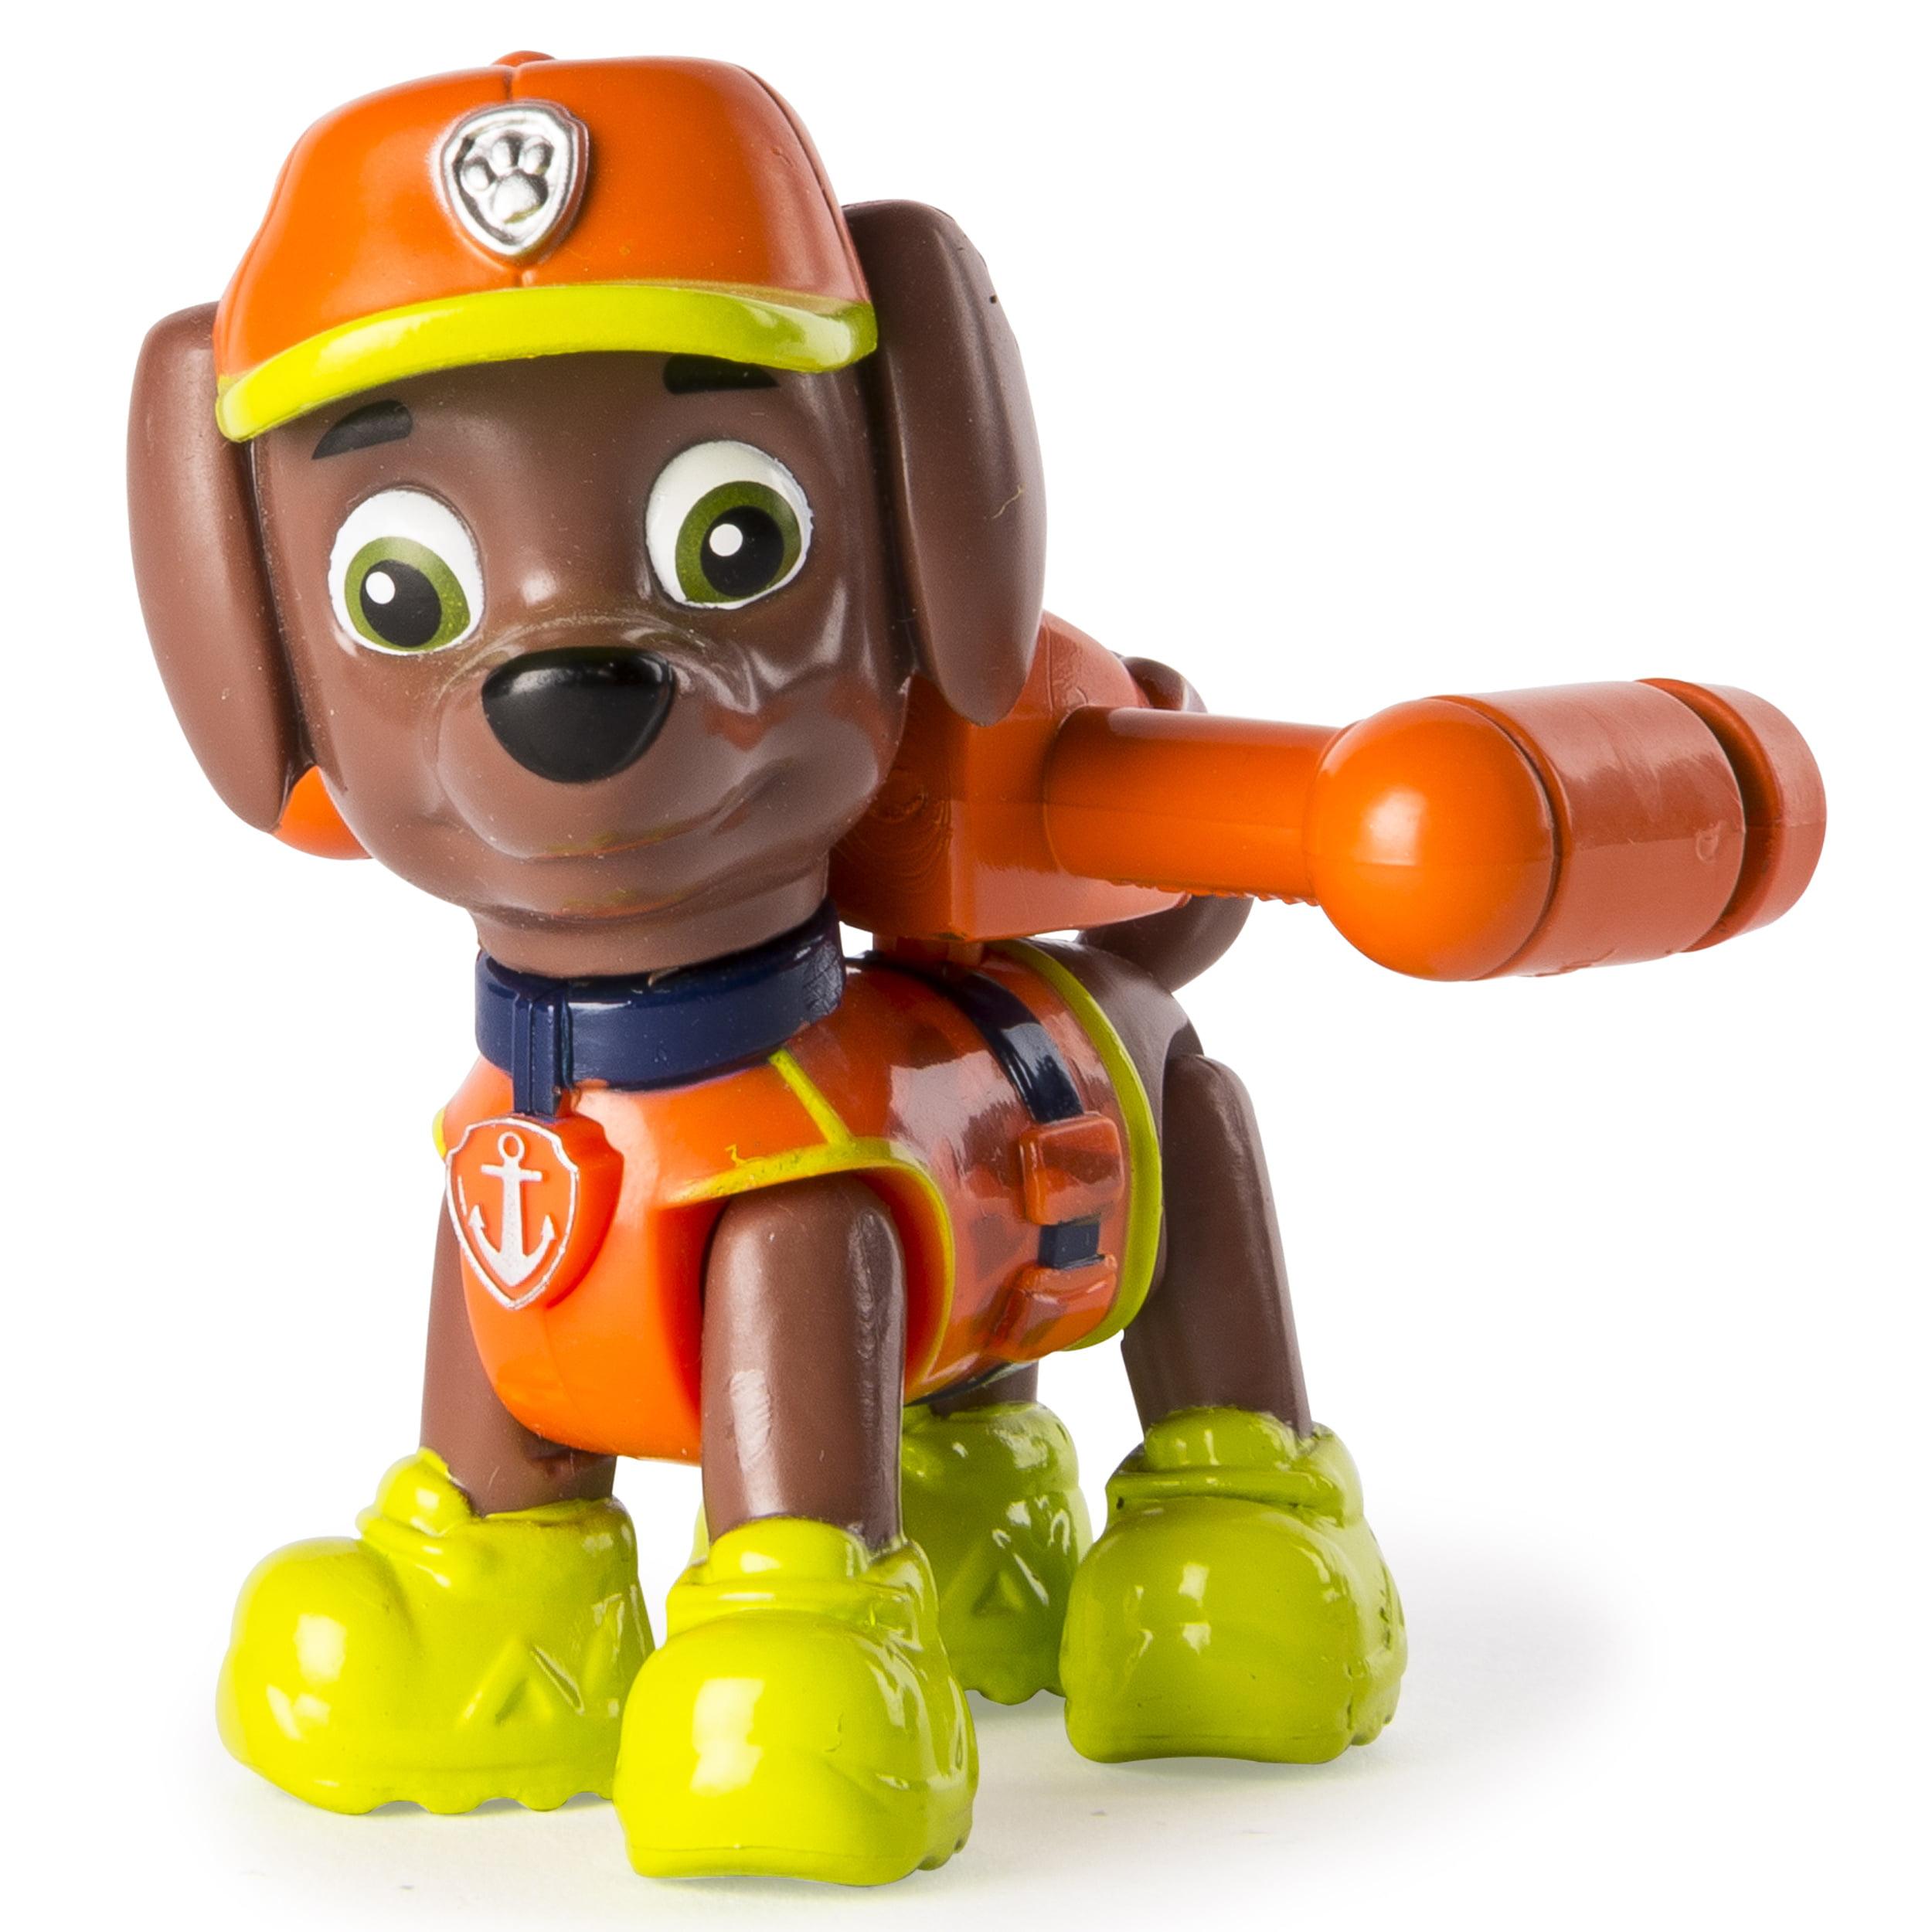 Zuma Paw Patrol Mission Paw Hero Pup